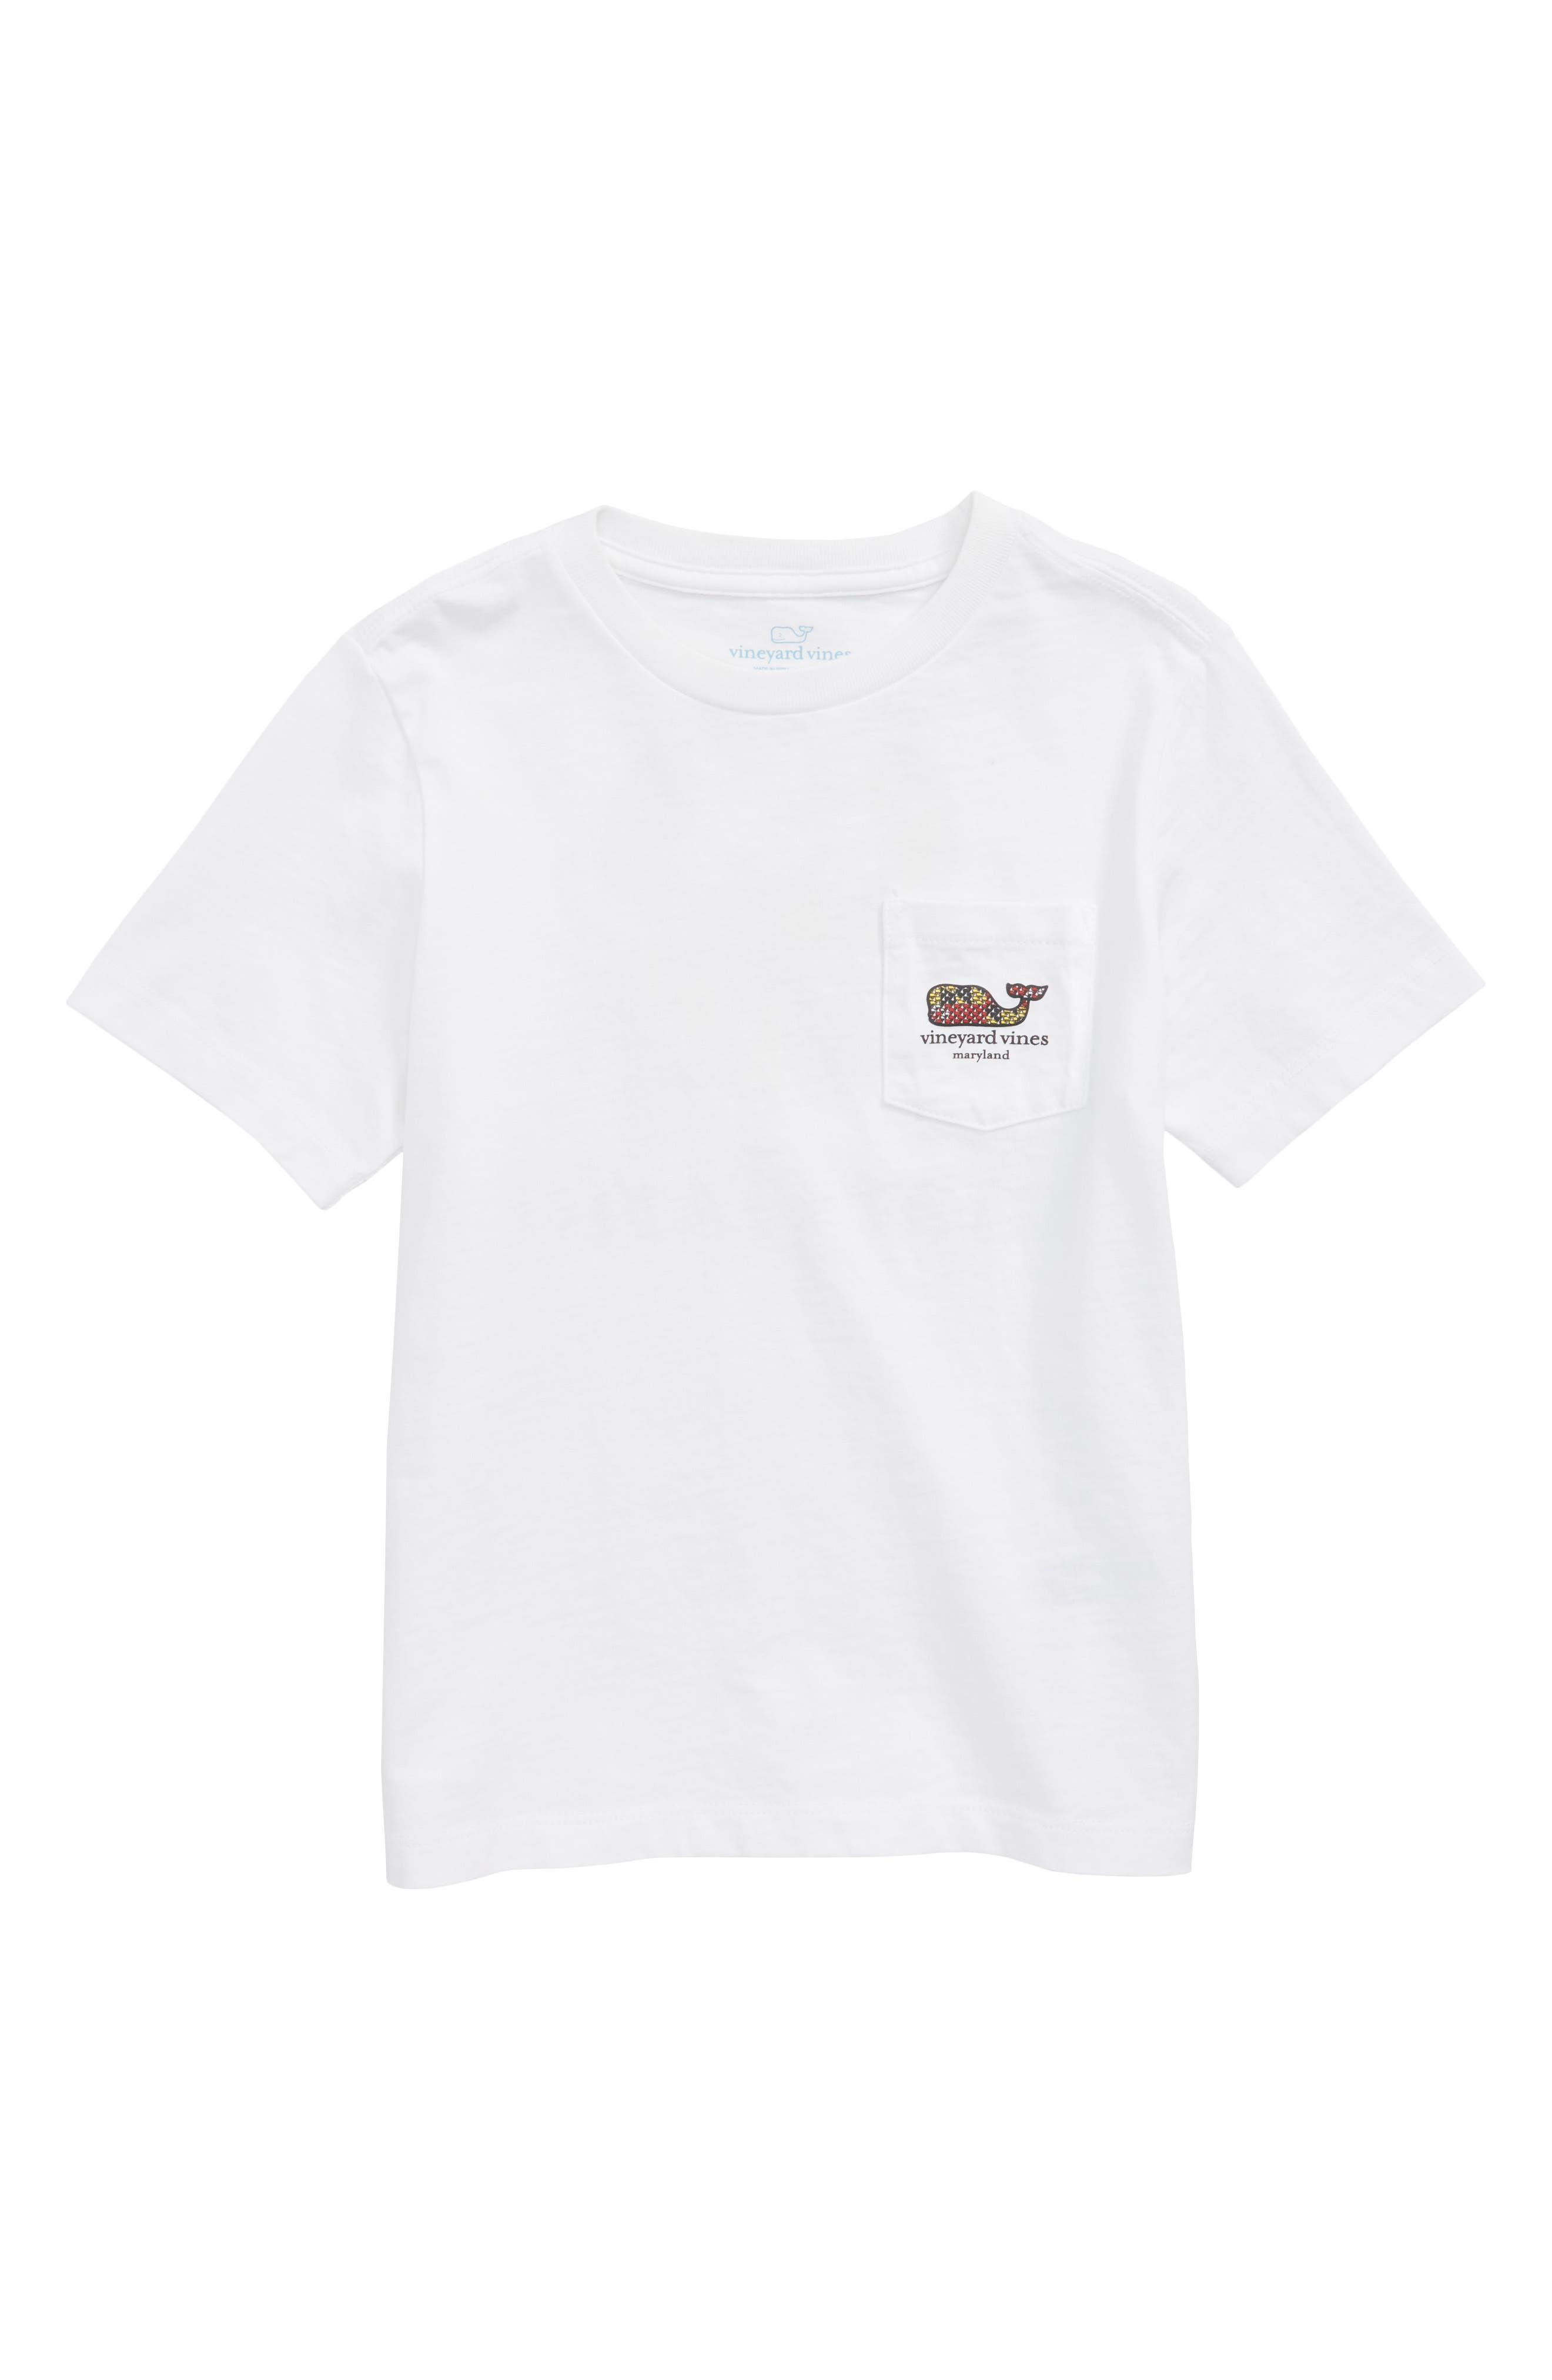 VINEYARD VINES,                             Maryland Crab Graphic Pocket T-Shirt,                             Main thumbnail 1, color,                             WHITE CAP